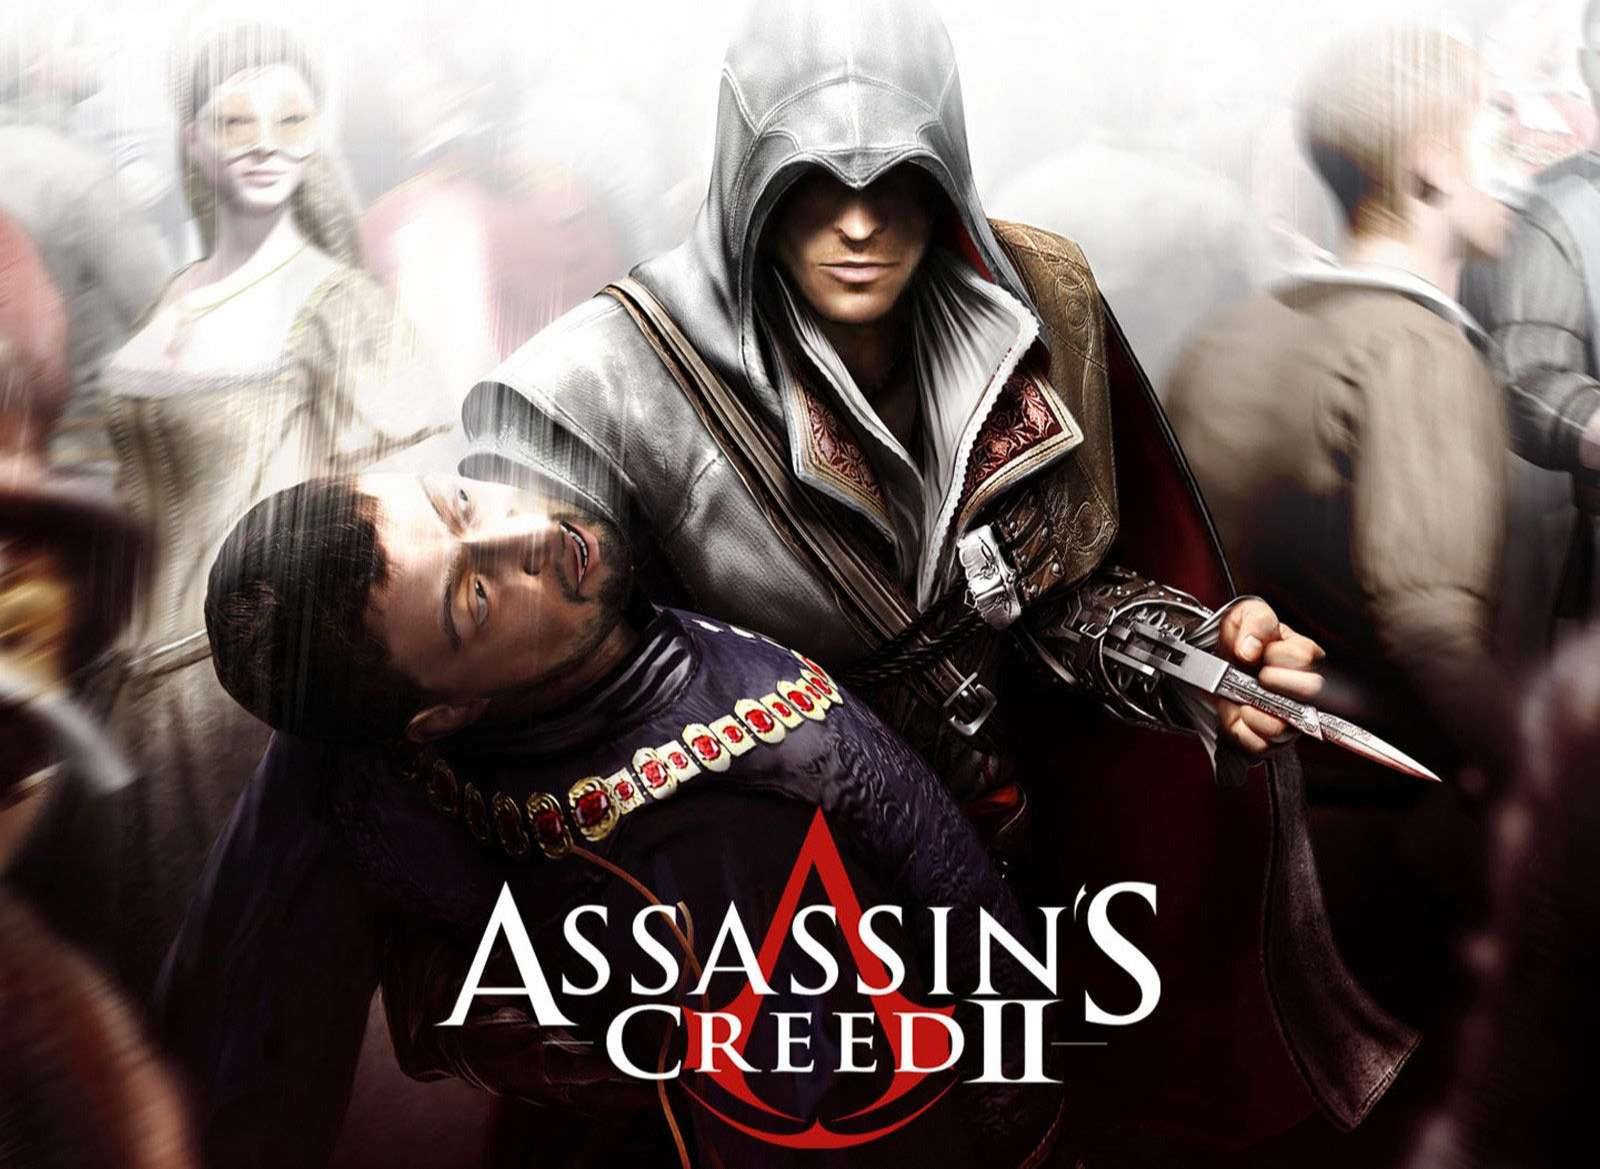 Assain Creed Video Game Wallpaper 012